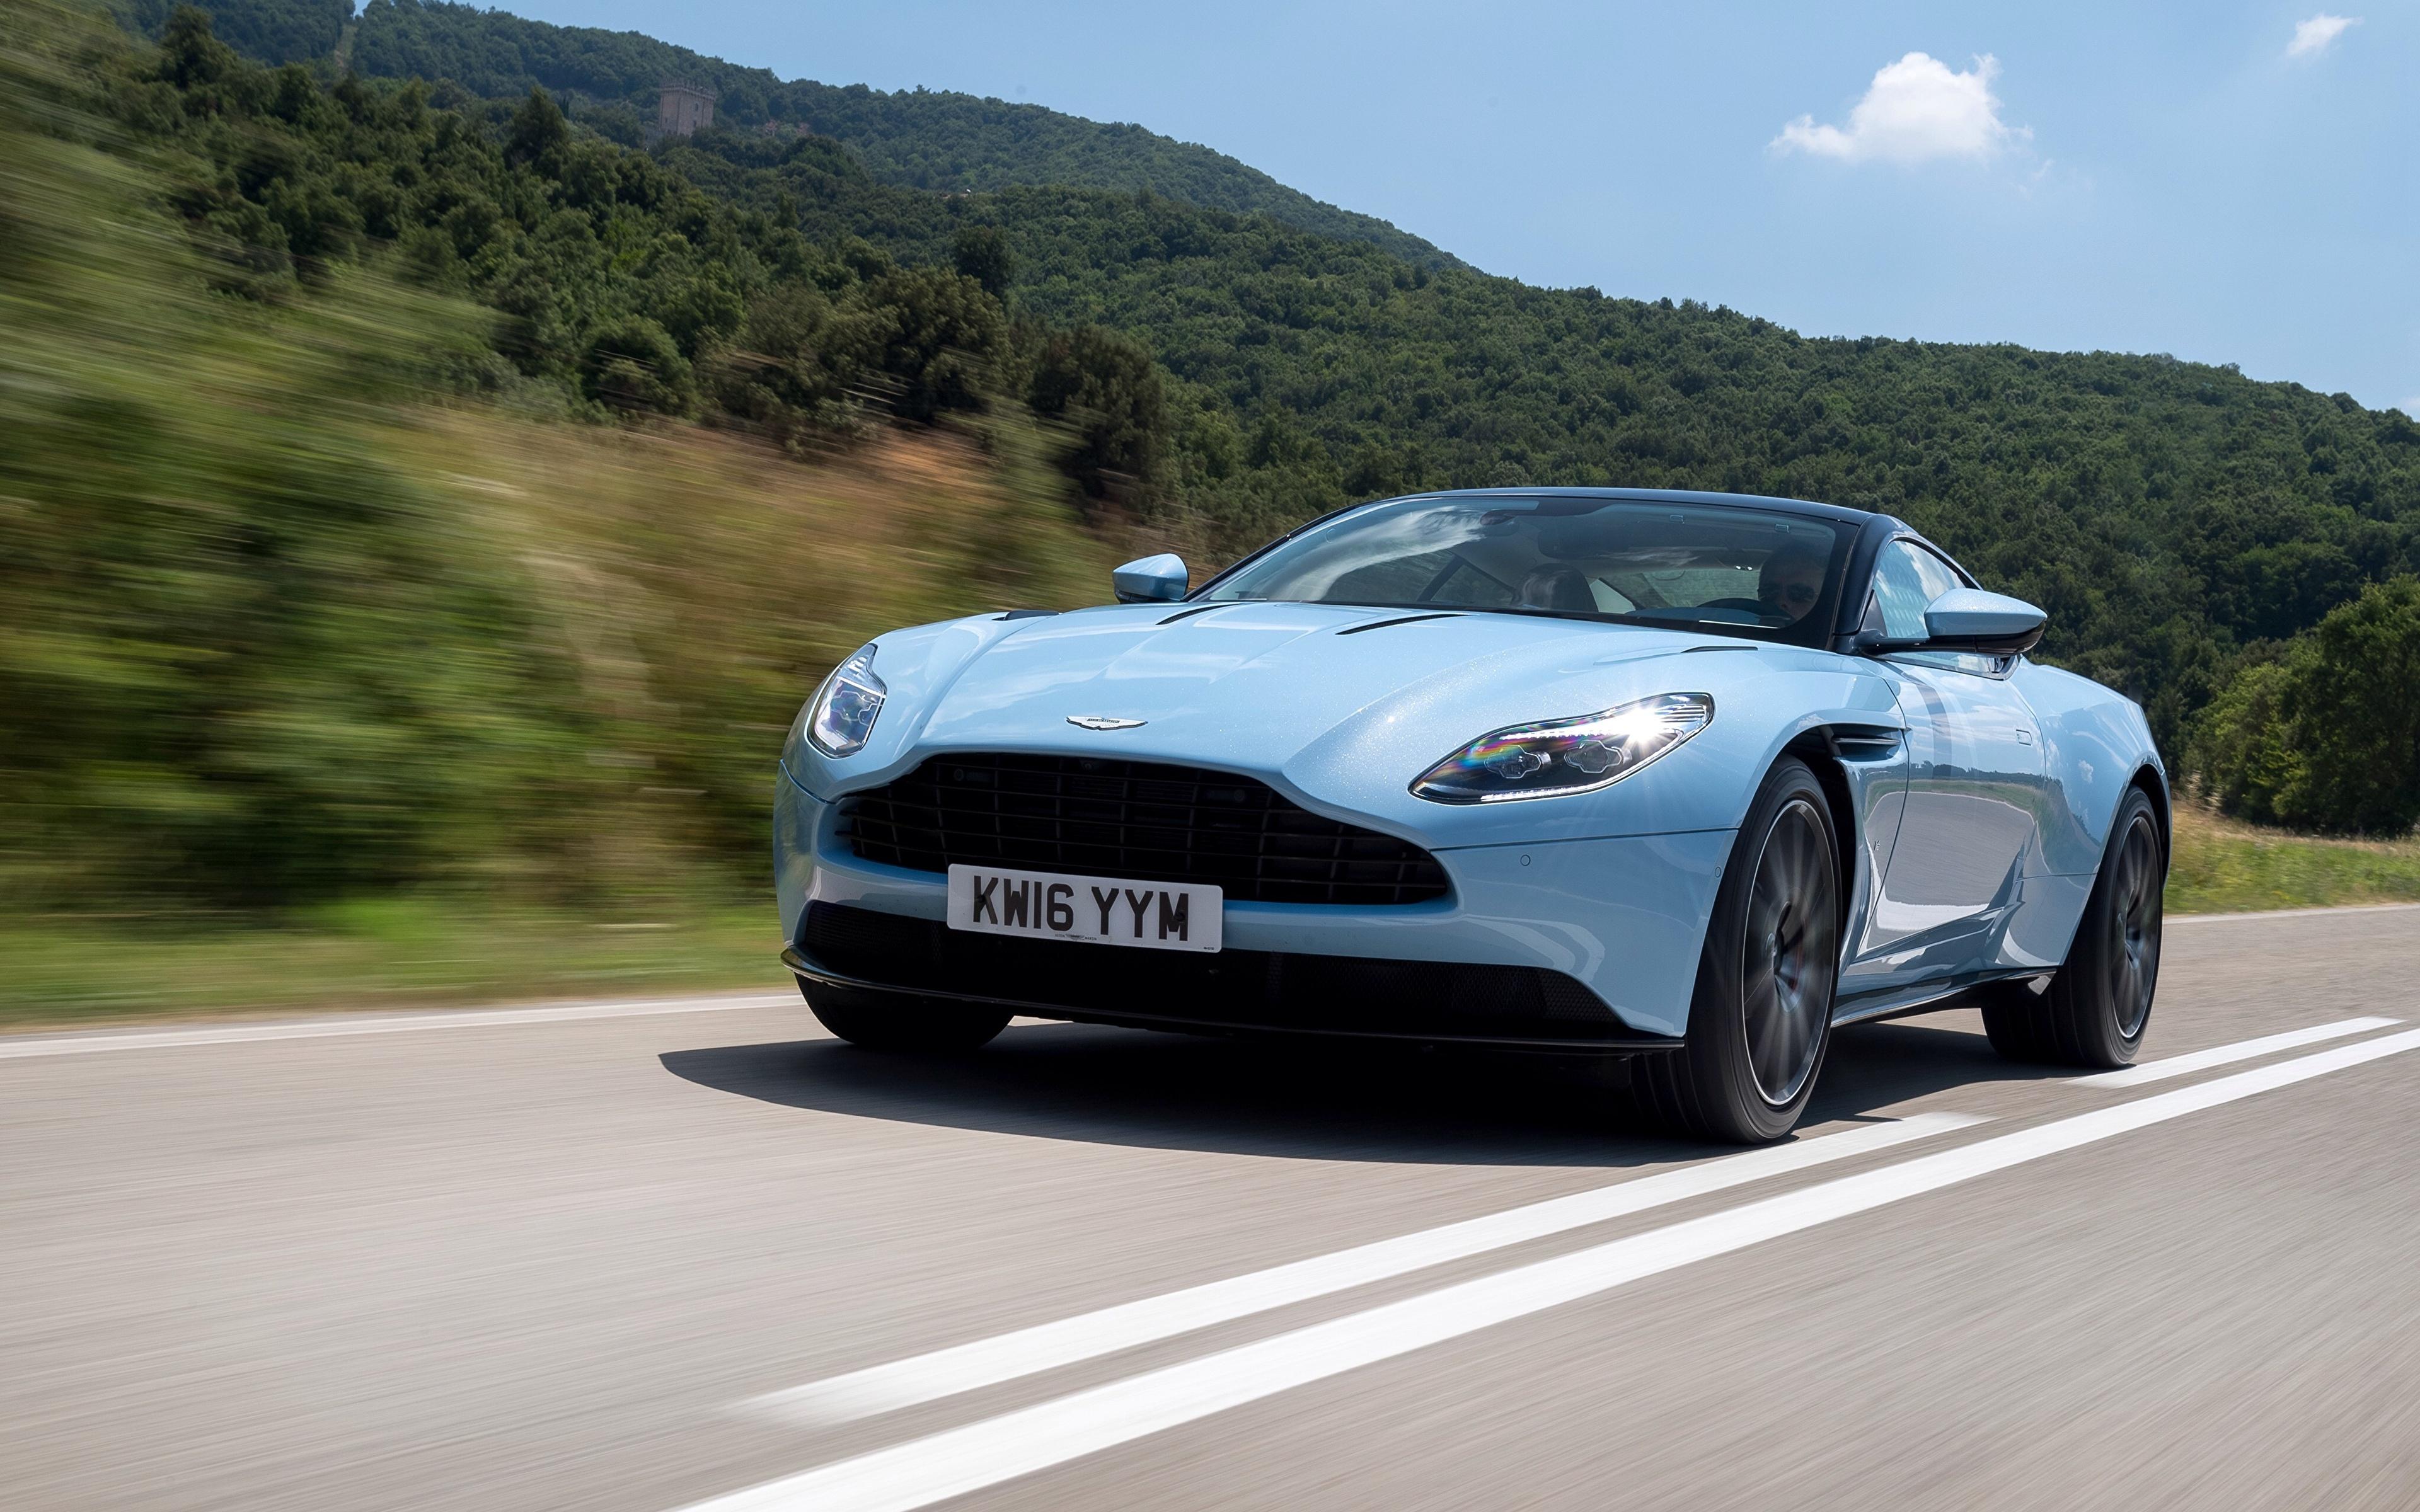 Bilder Aston Martin Hellblau Autos 3840x2400 auto automobil